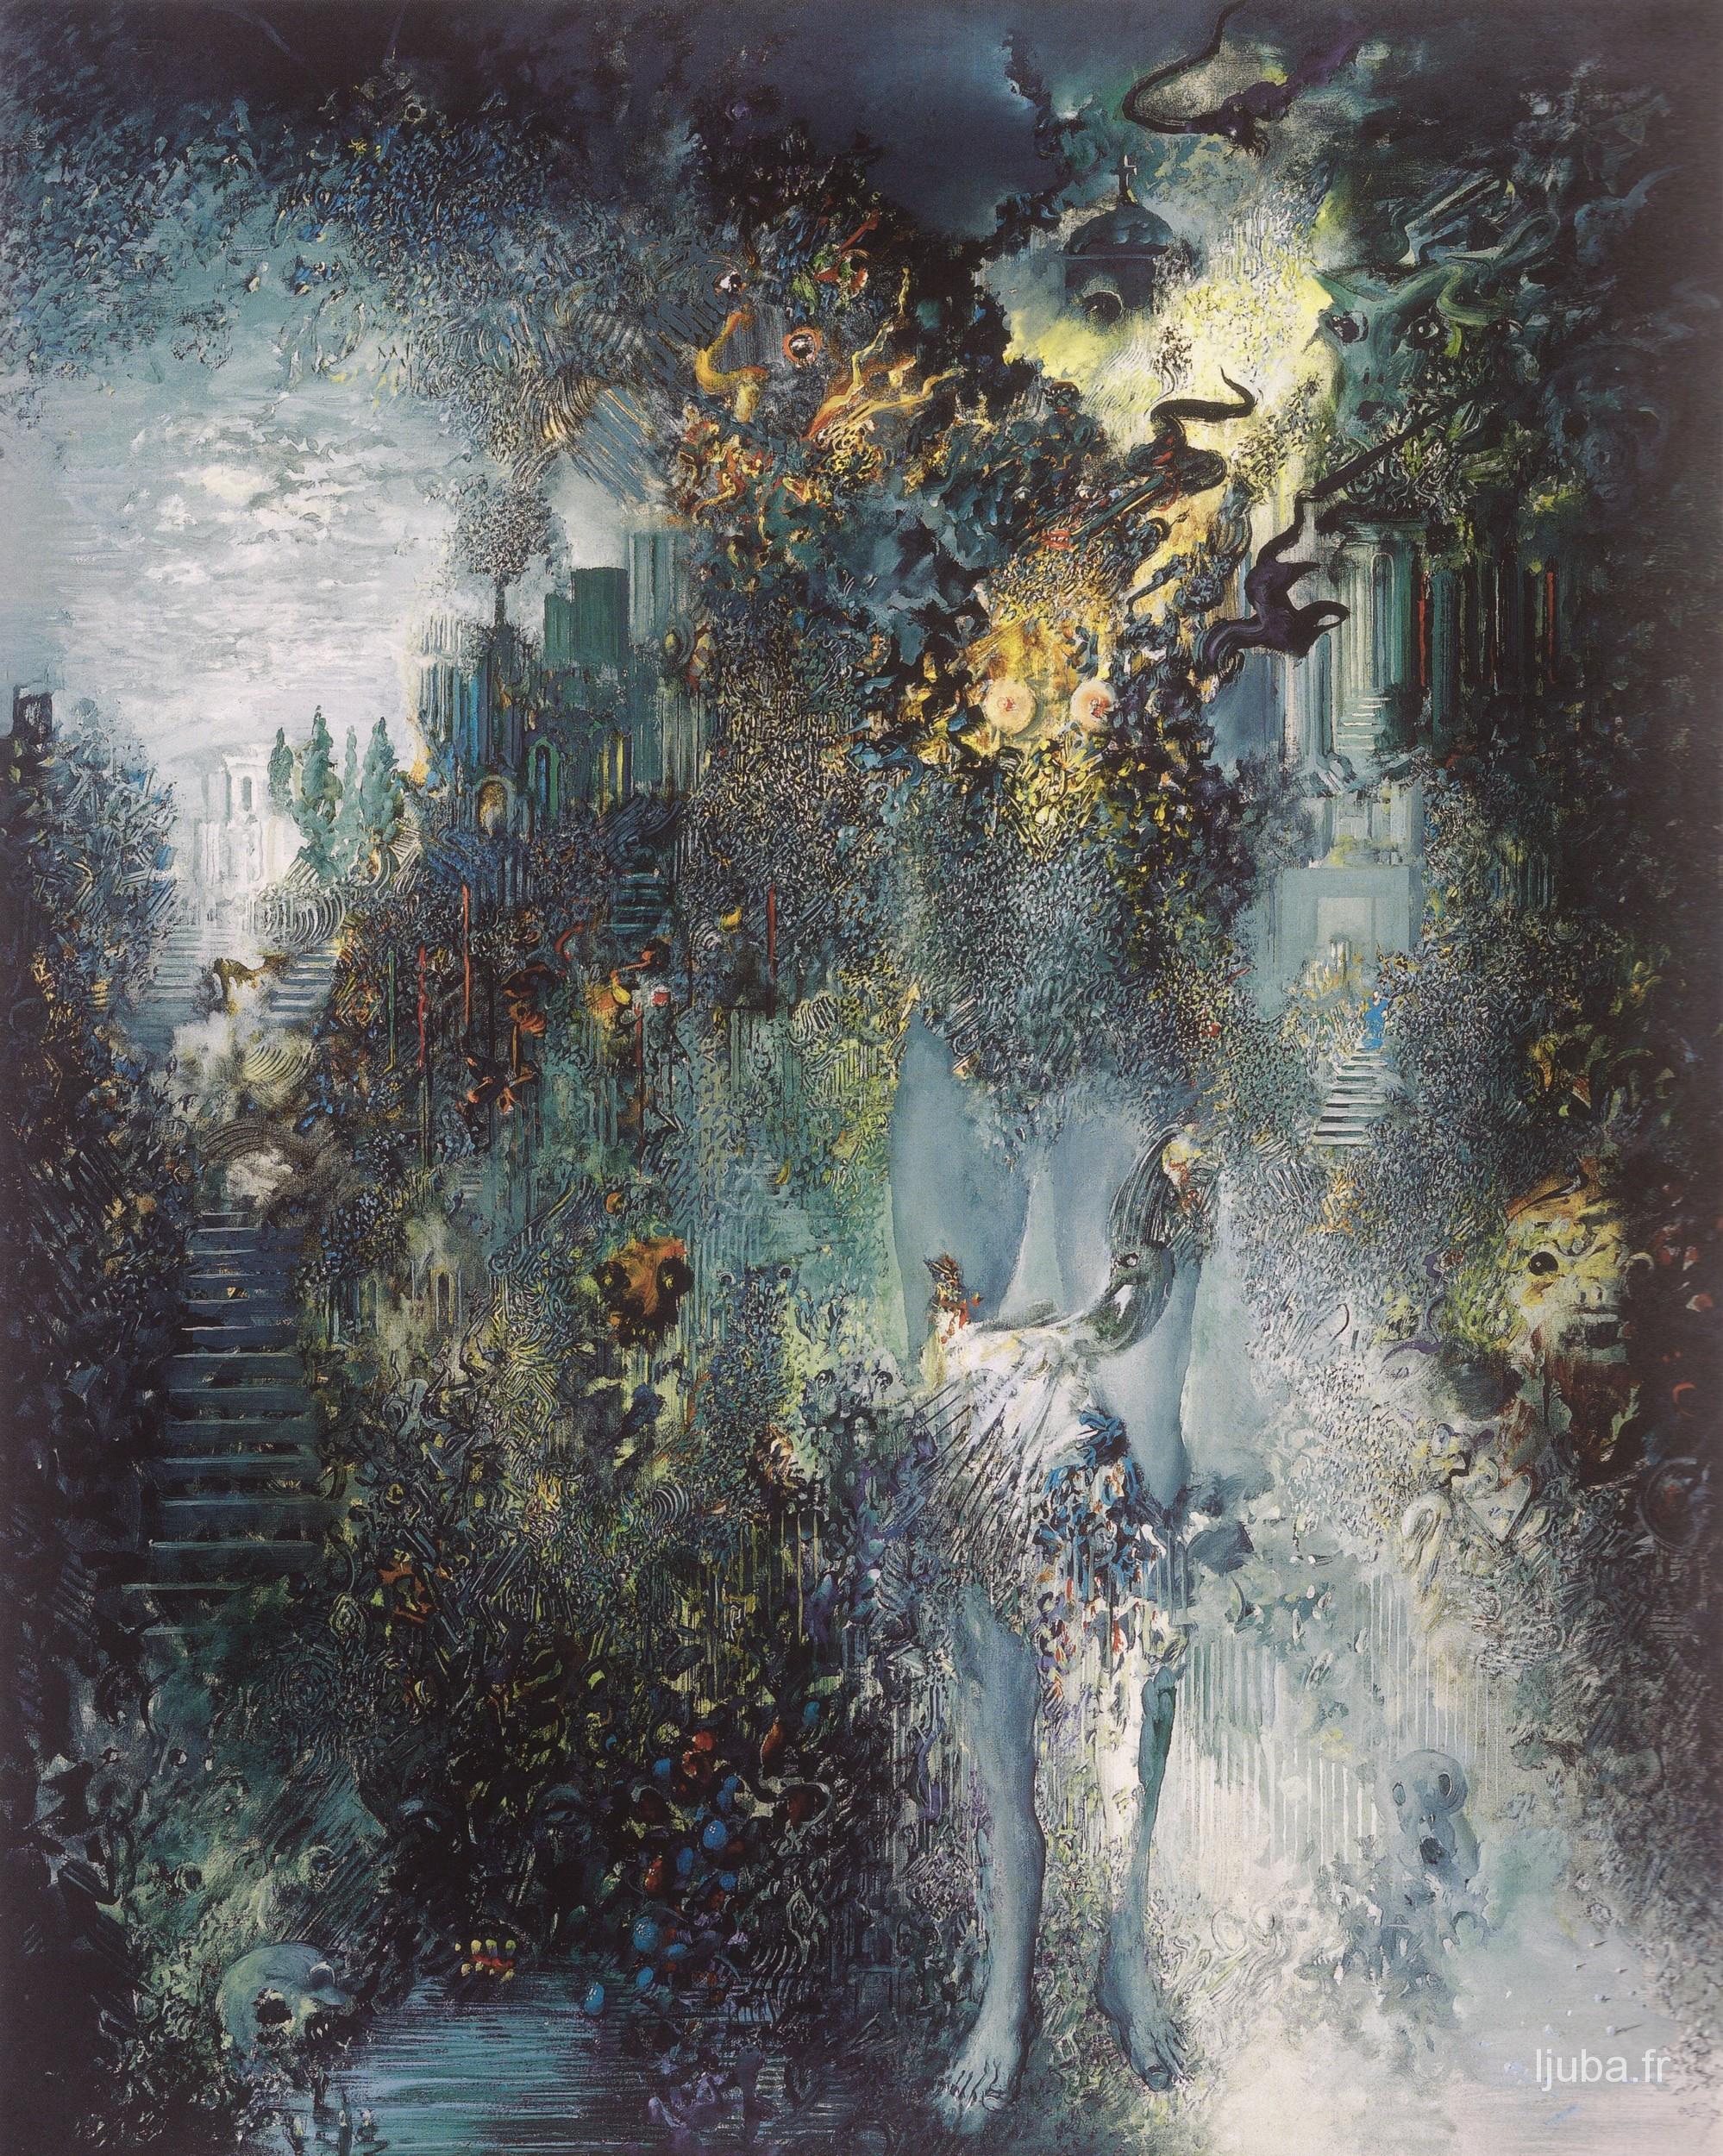 Ljuba Popovic - 1994, Le jardin du paon mort